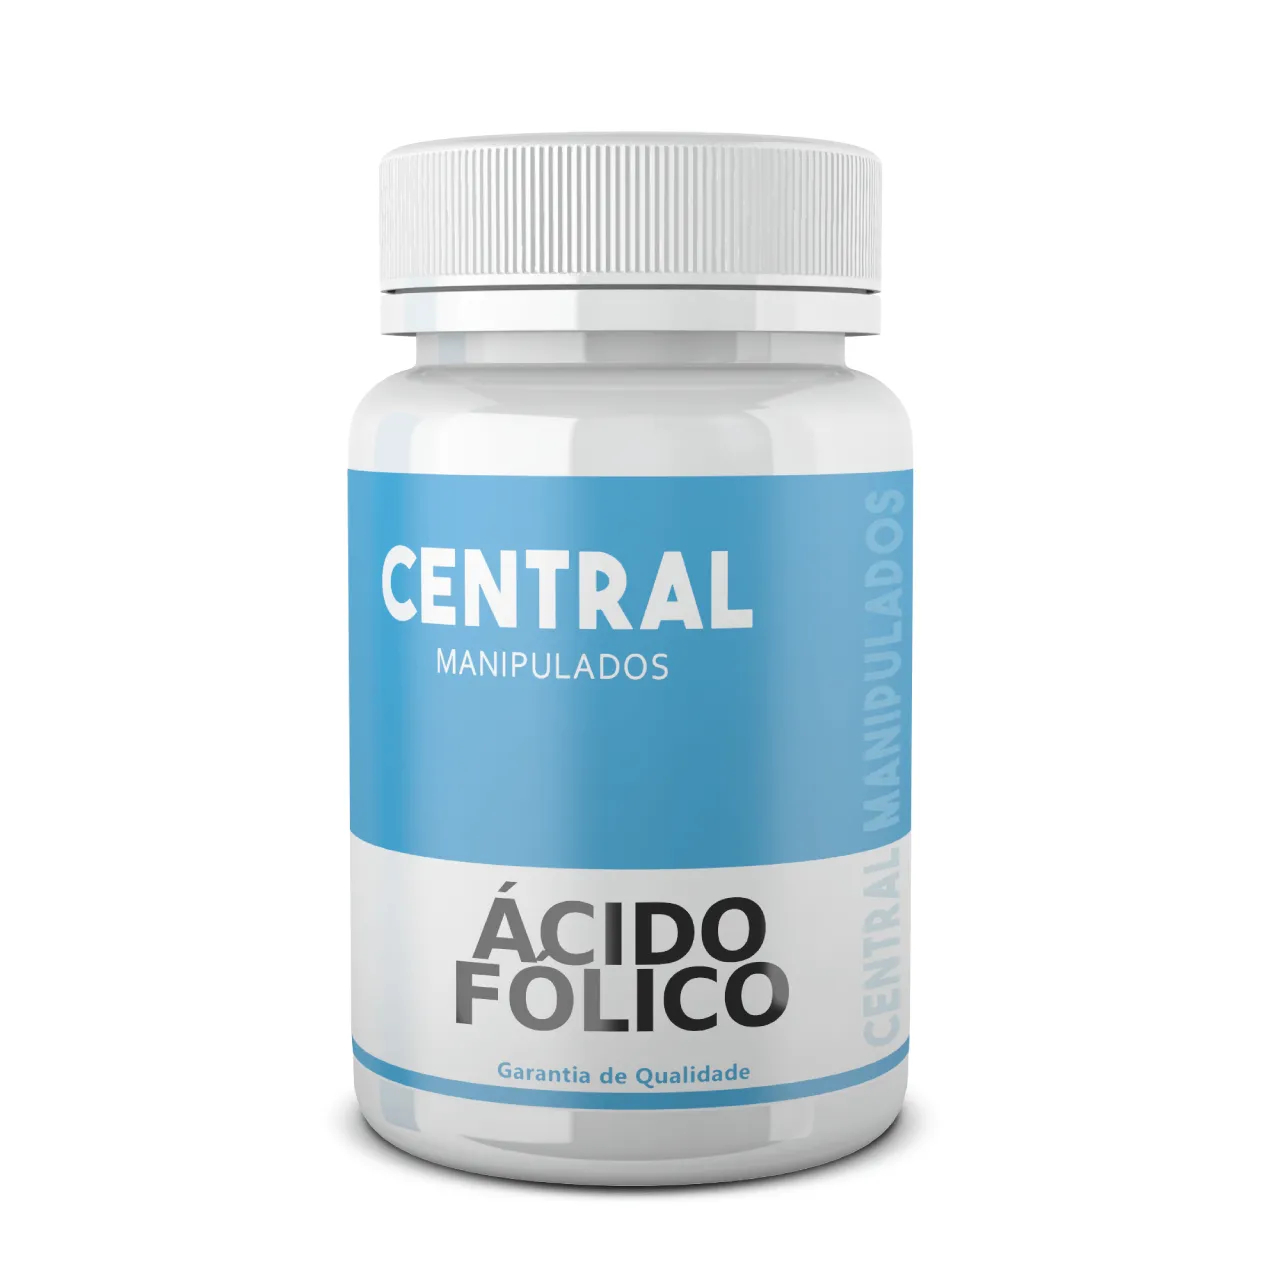 Ácido Fólico 800mcg - 60 cápsulas - Vitamina B9